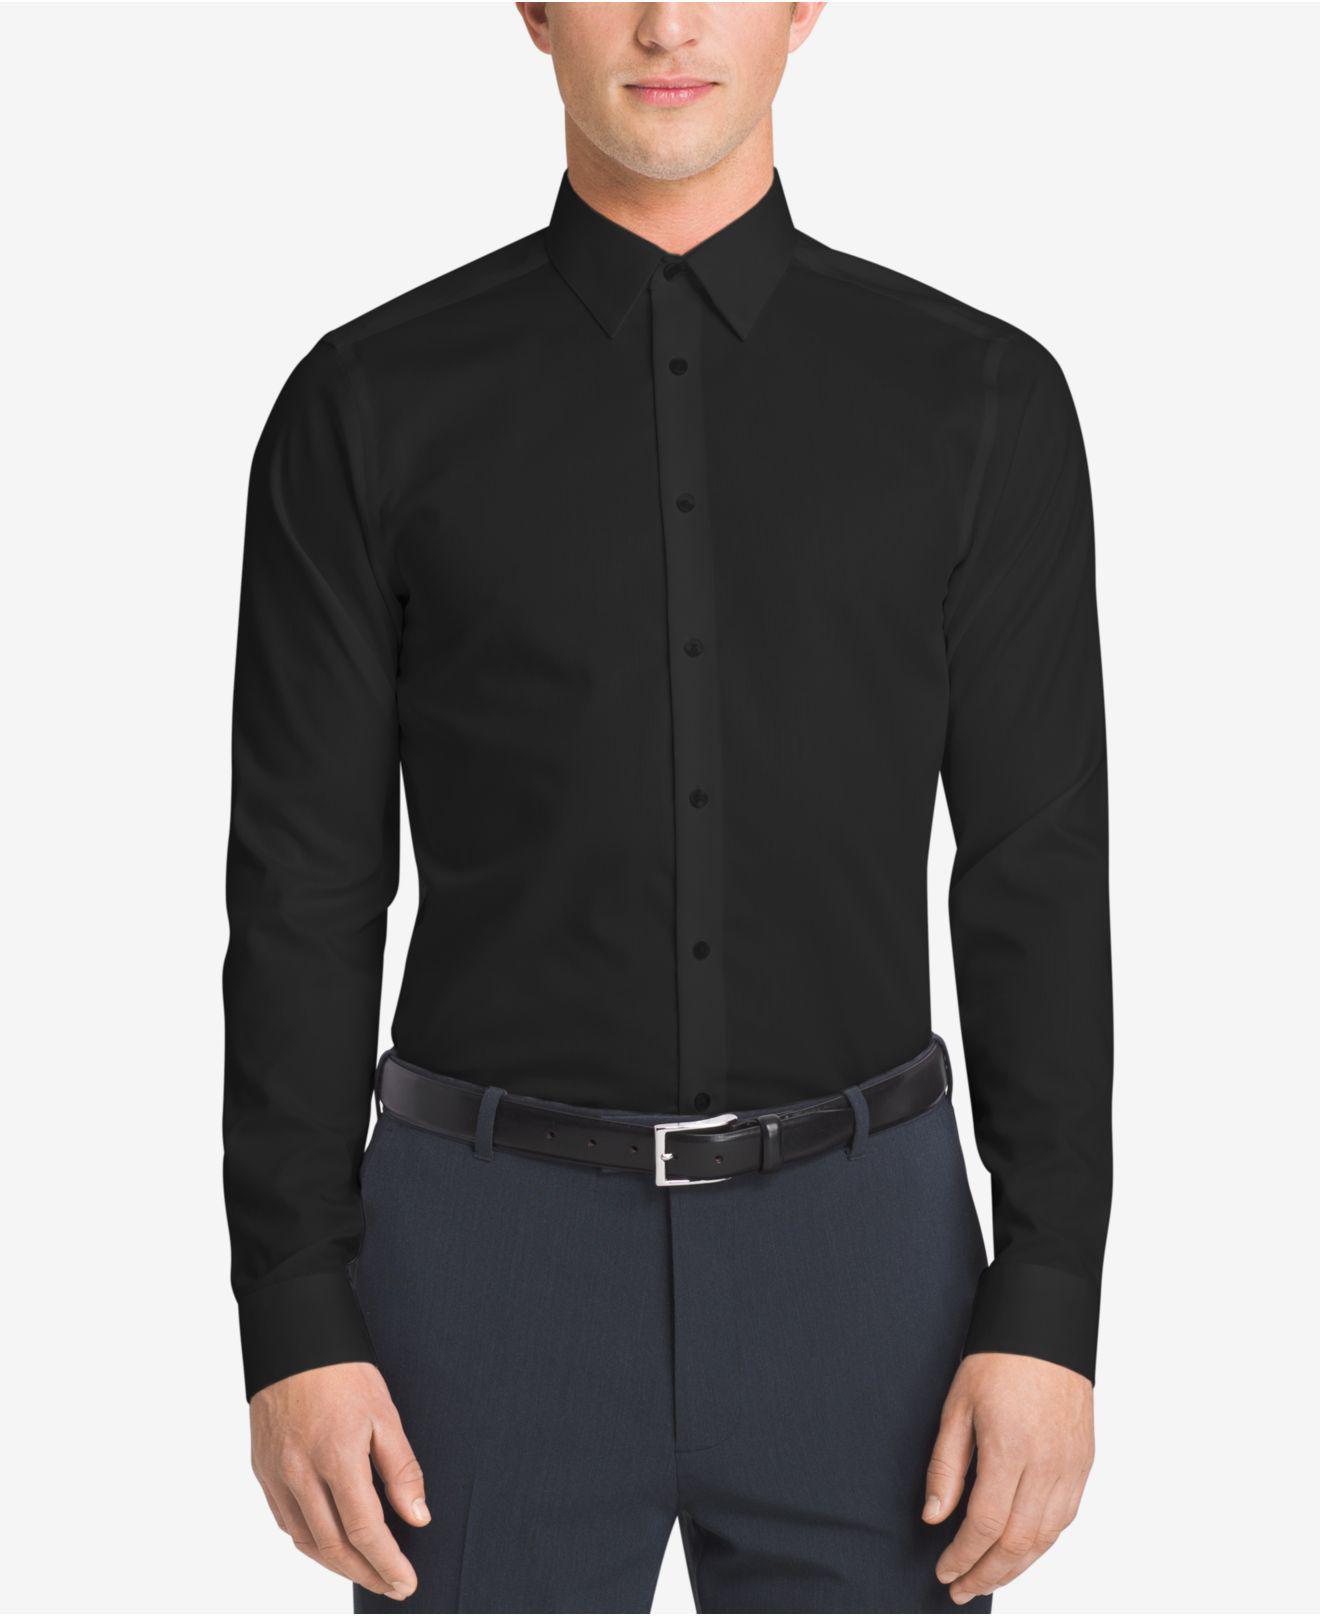 bbdcbc921 Calvin Klein. Black Men s Slim-fit Non-iron Performance Herringbone Dress  Shirt